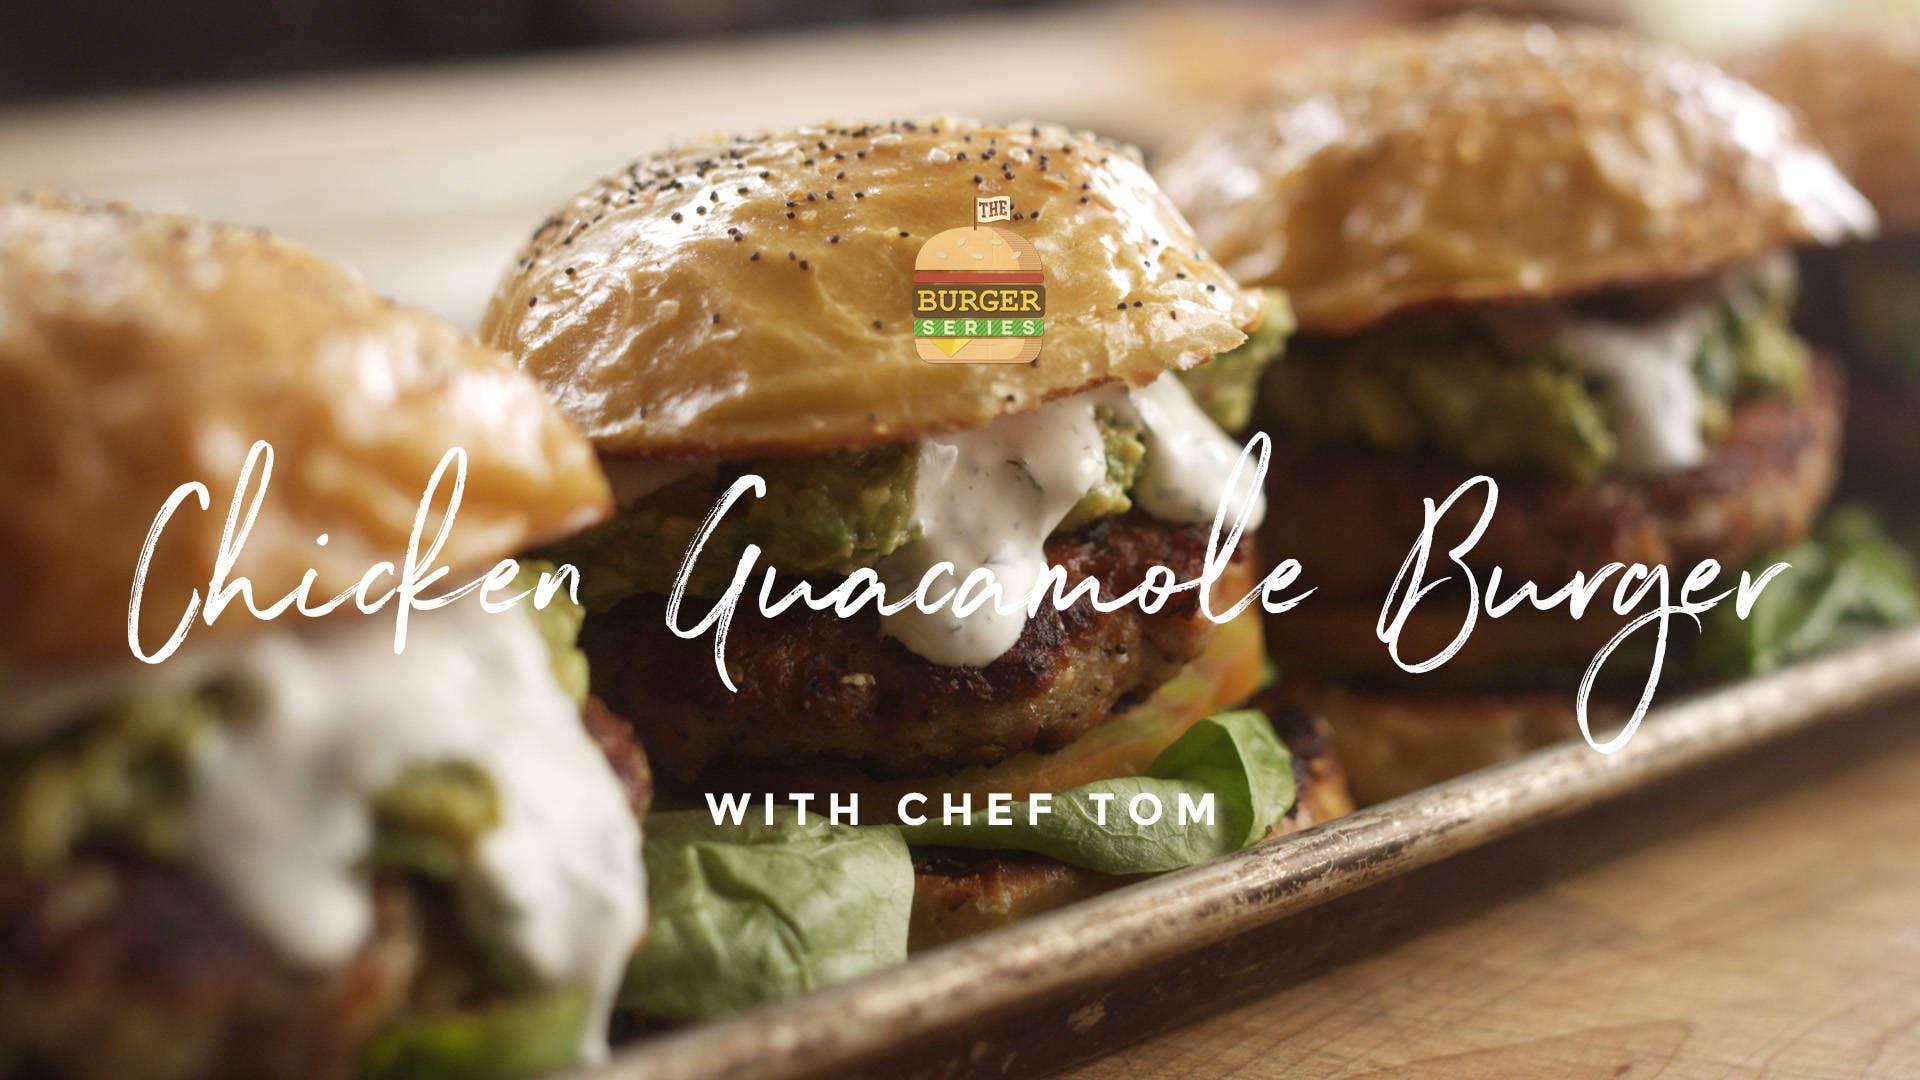 How to make Chicken Guacamole Burgers